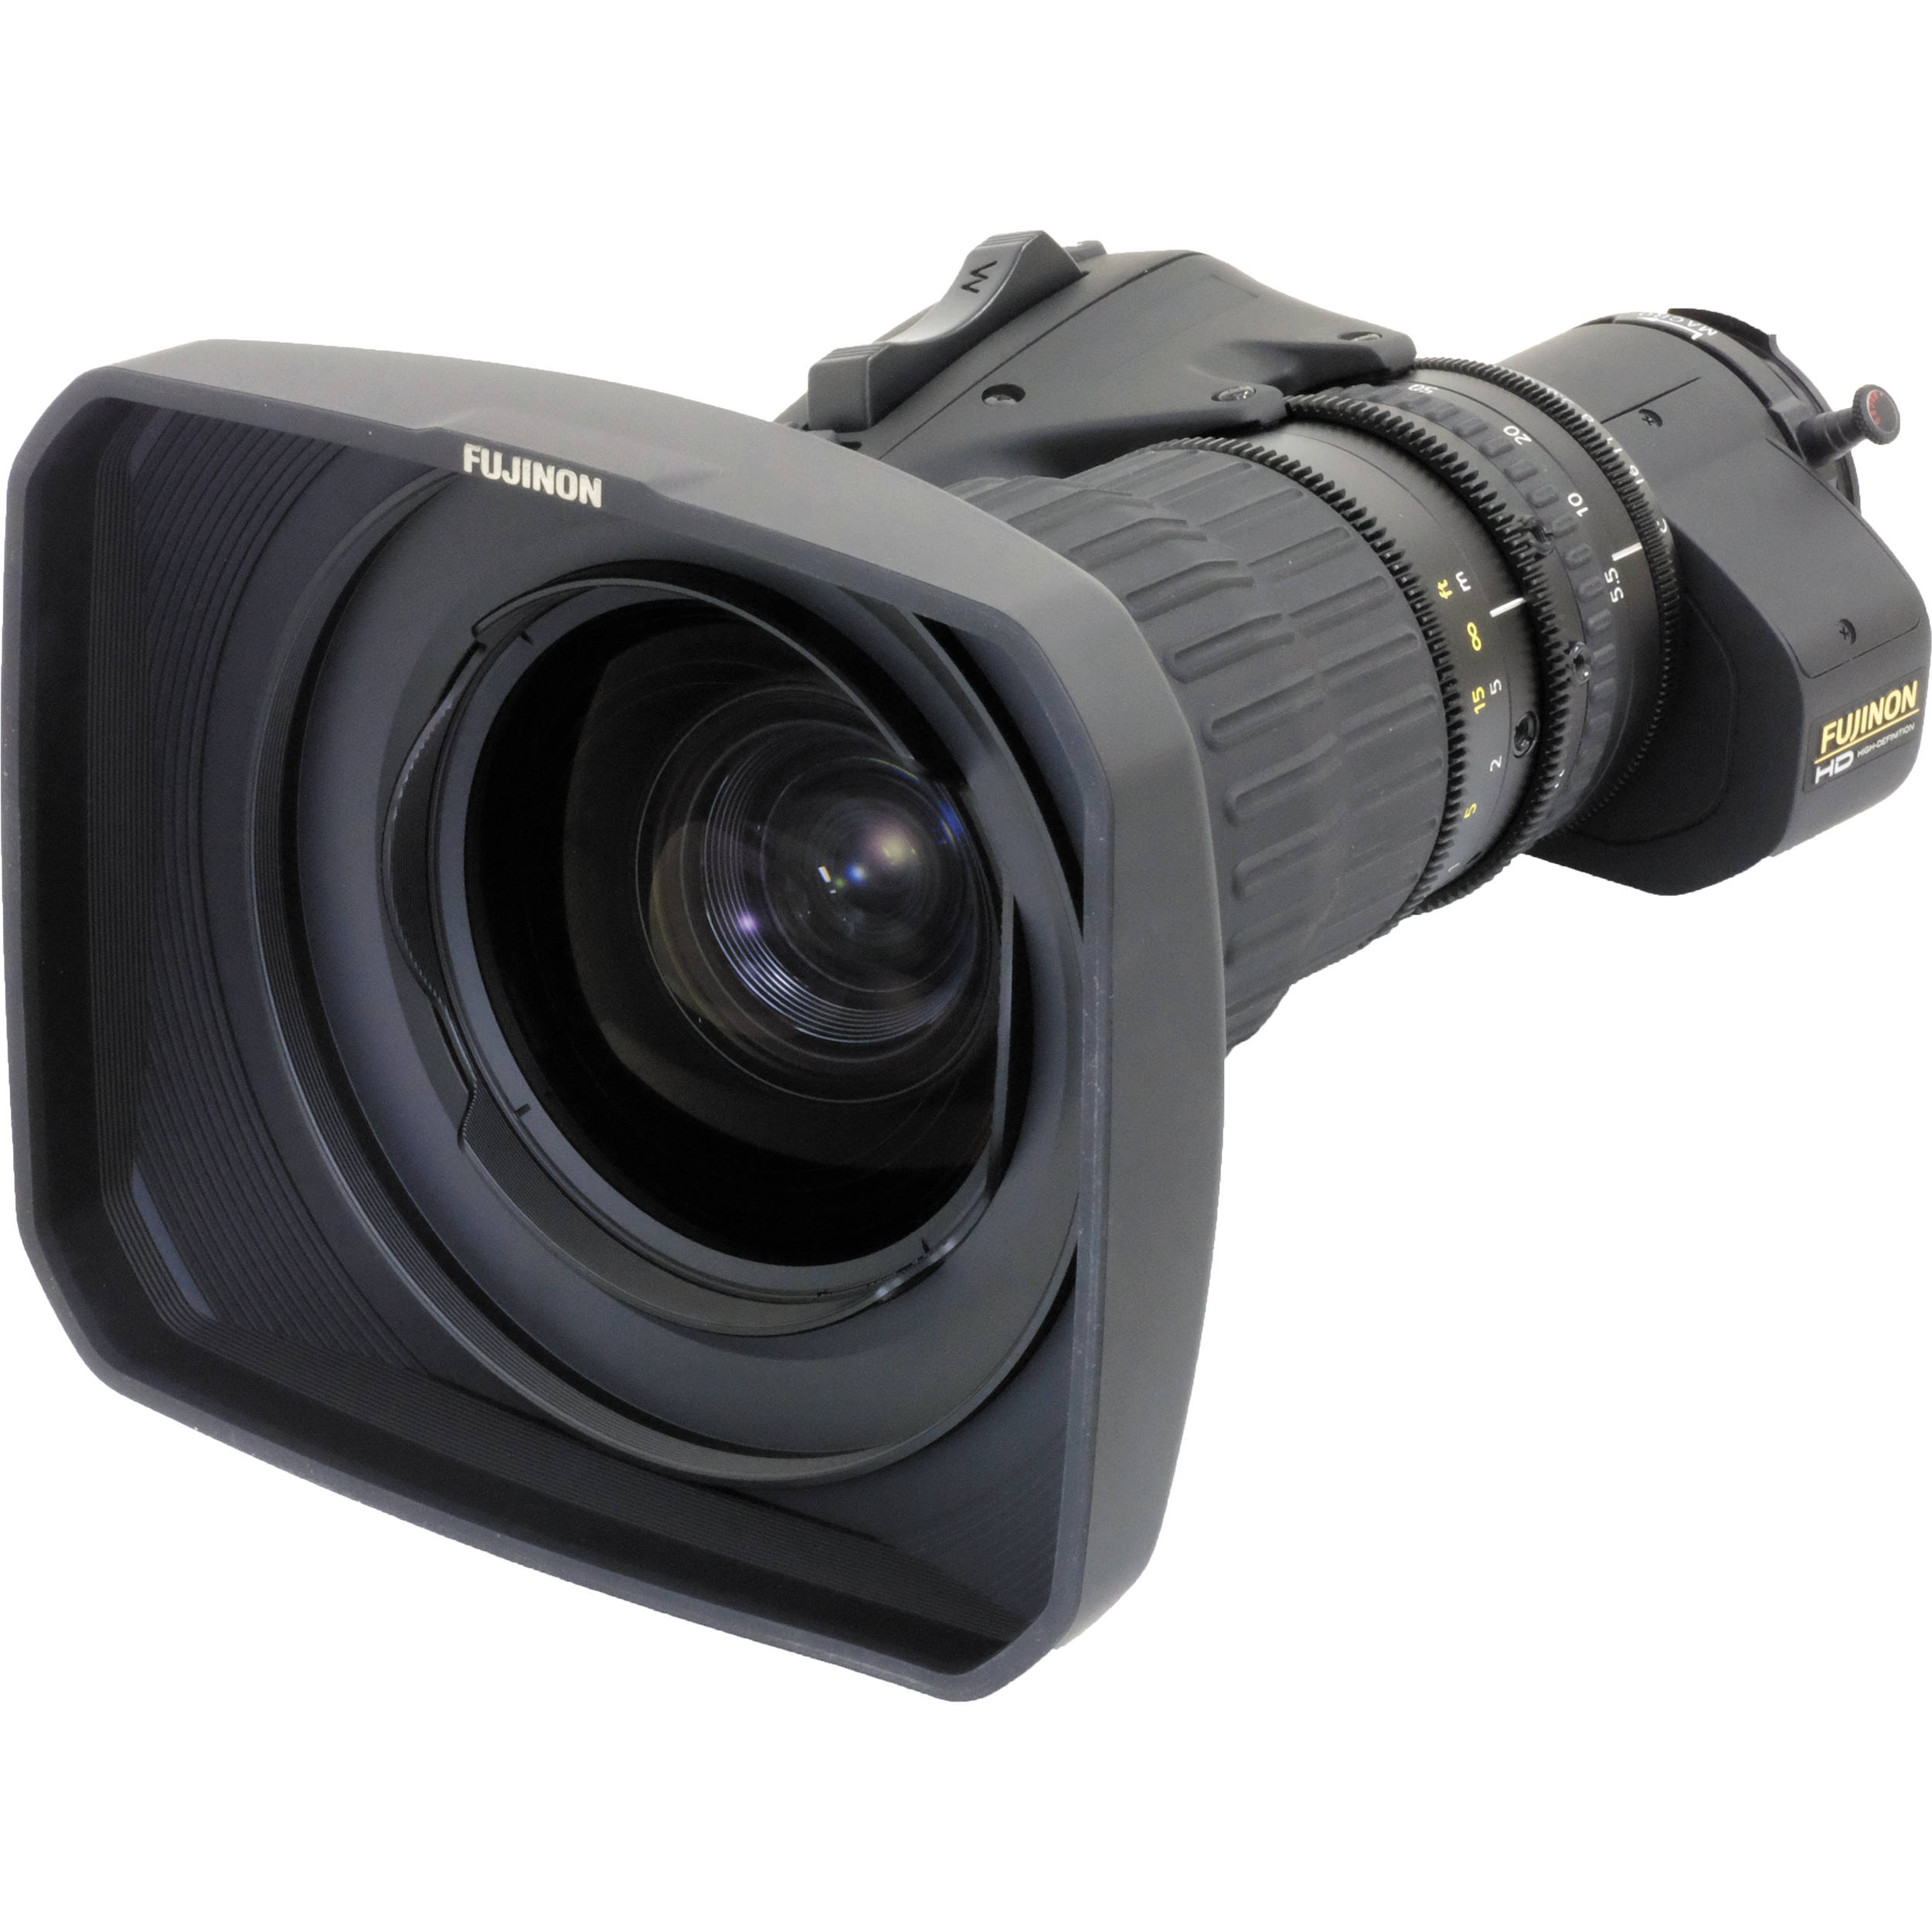 Fujinon HA18X5.5BERM-M6 Premier Series ENG/EFP Lens with Manual Focus,